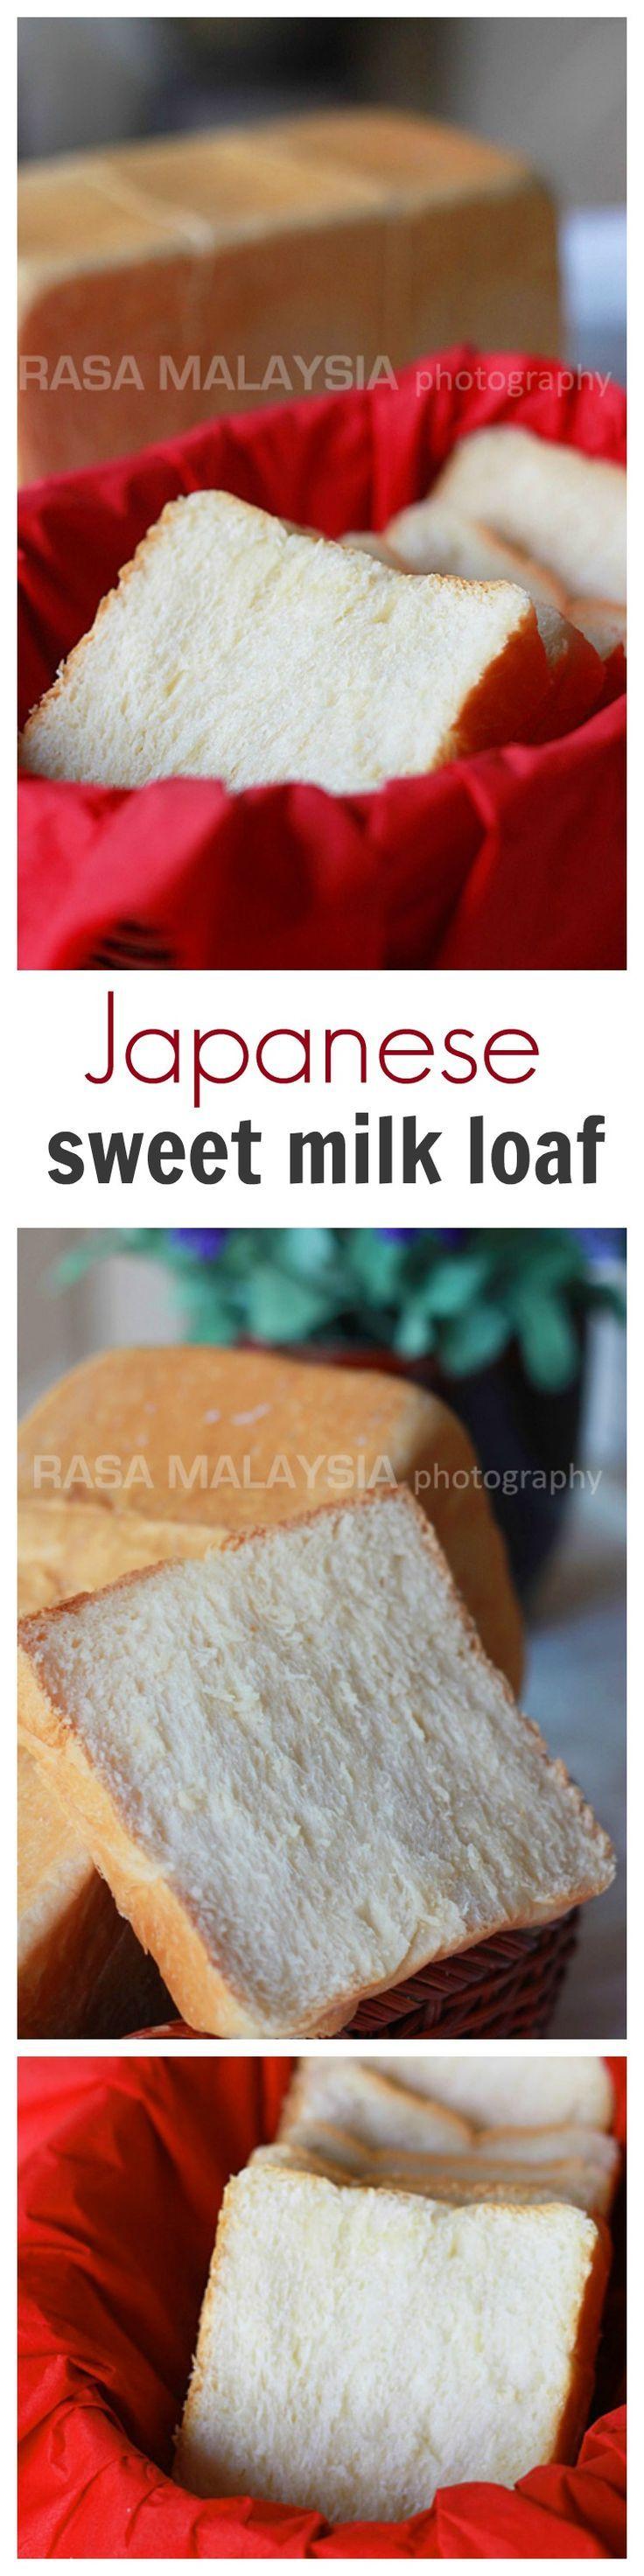 Japanese Shoku Pan // 4 1/2 c bread flour 1/2 c AP flour ...